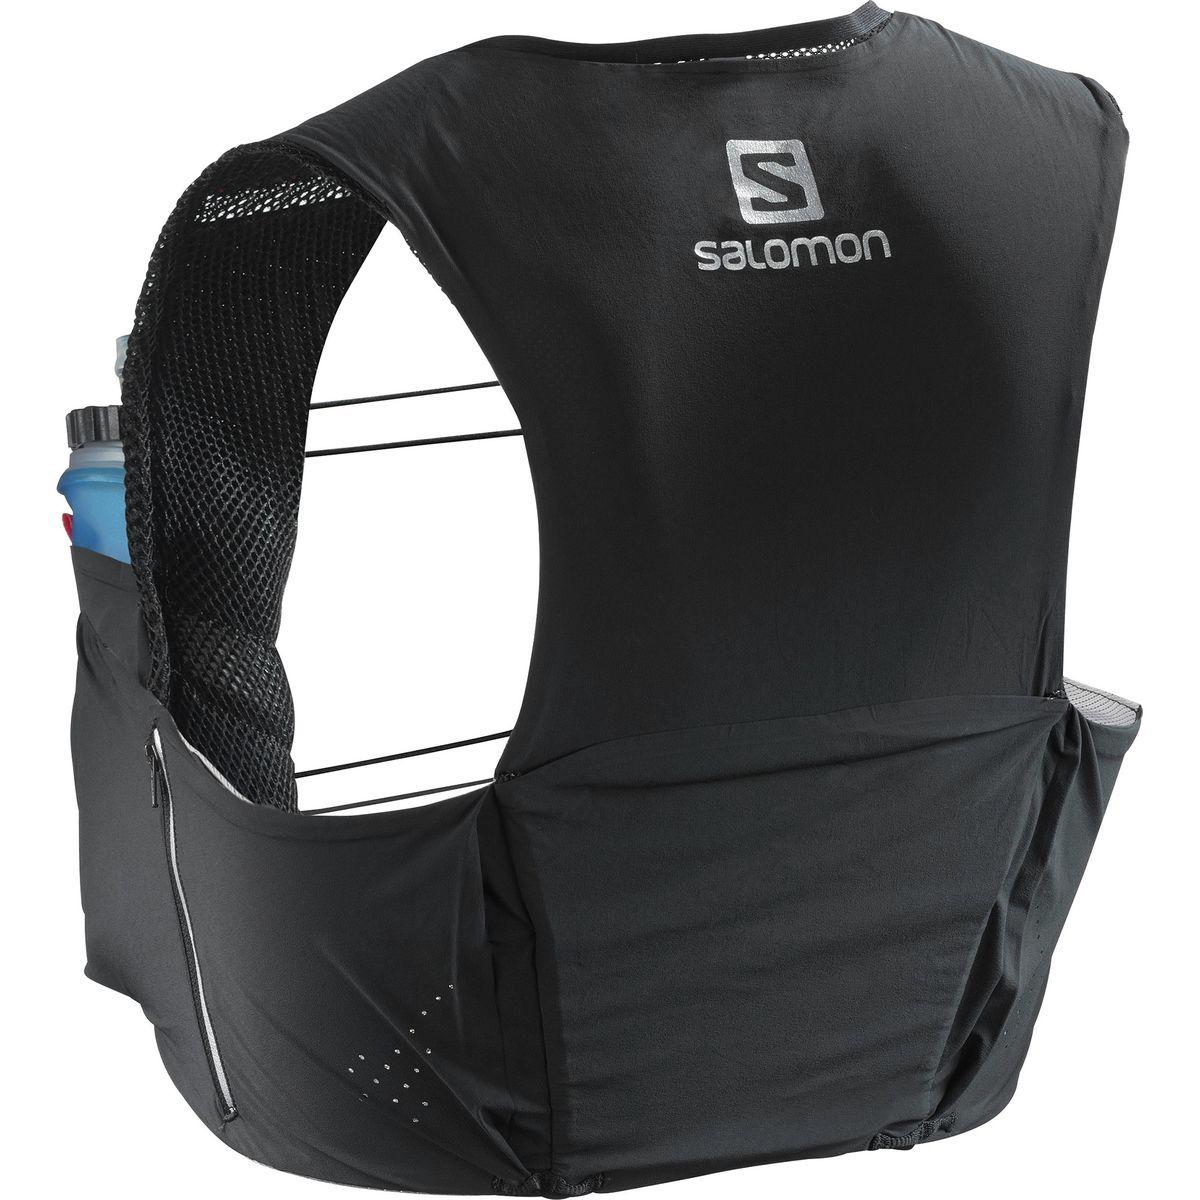 Salomon SLab Sense Ultra 5 Set Hydration Vest 305cu in